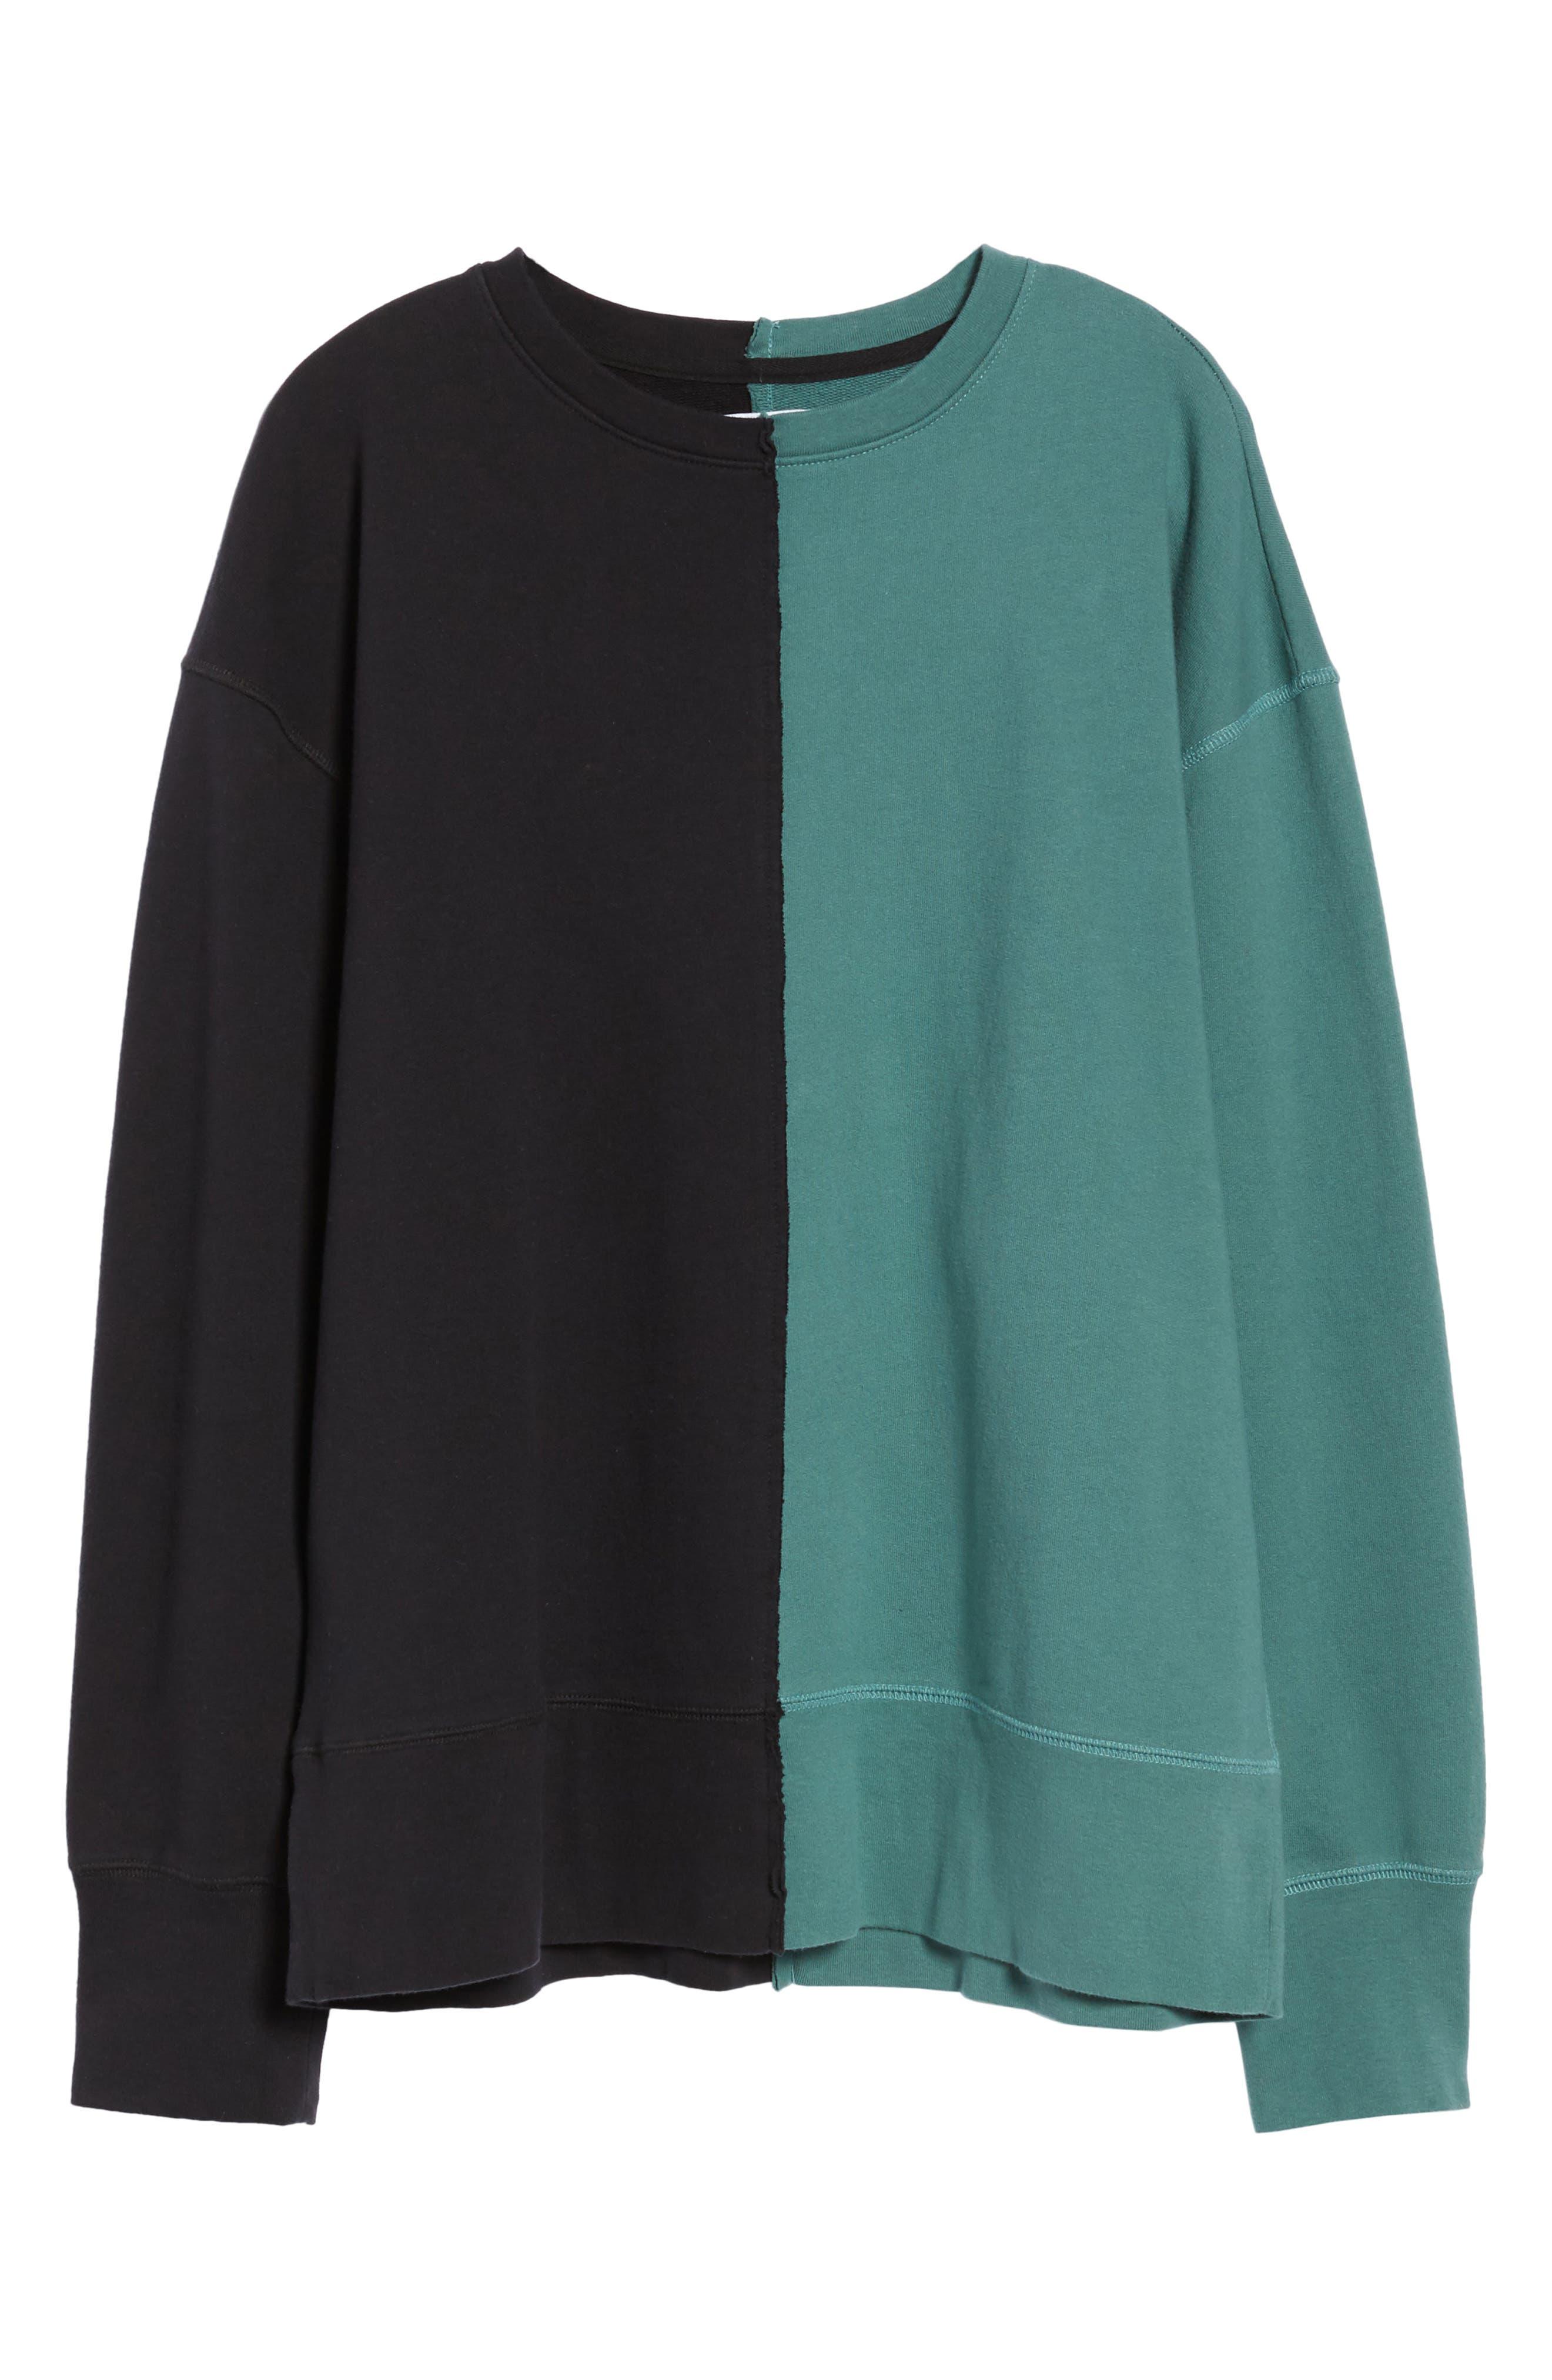 Colorblock T-Shirt,                             Alternate thumbnail 6, color,                             Black Rock / Green Pine